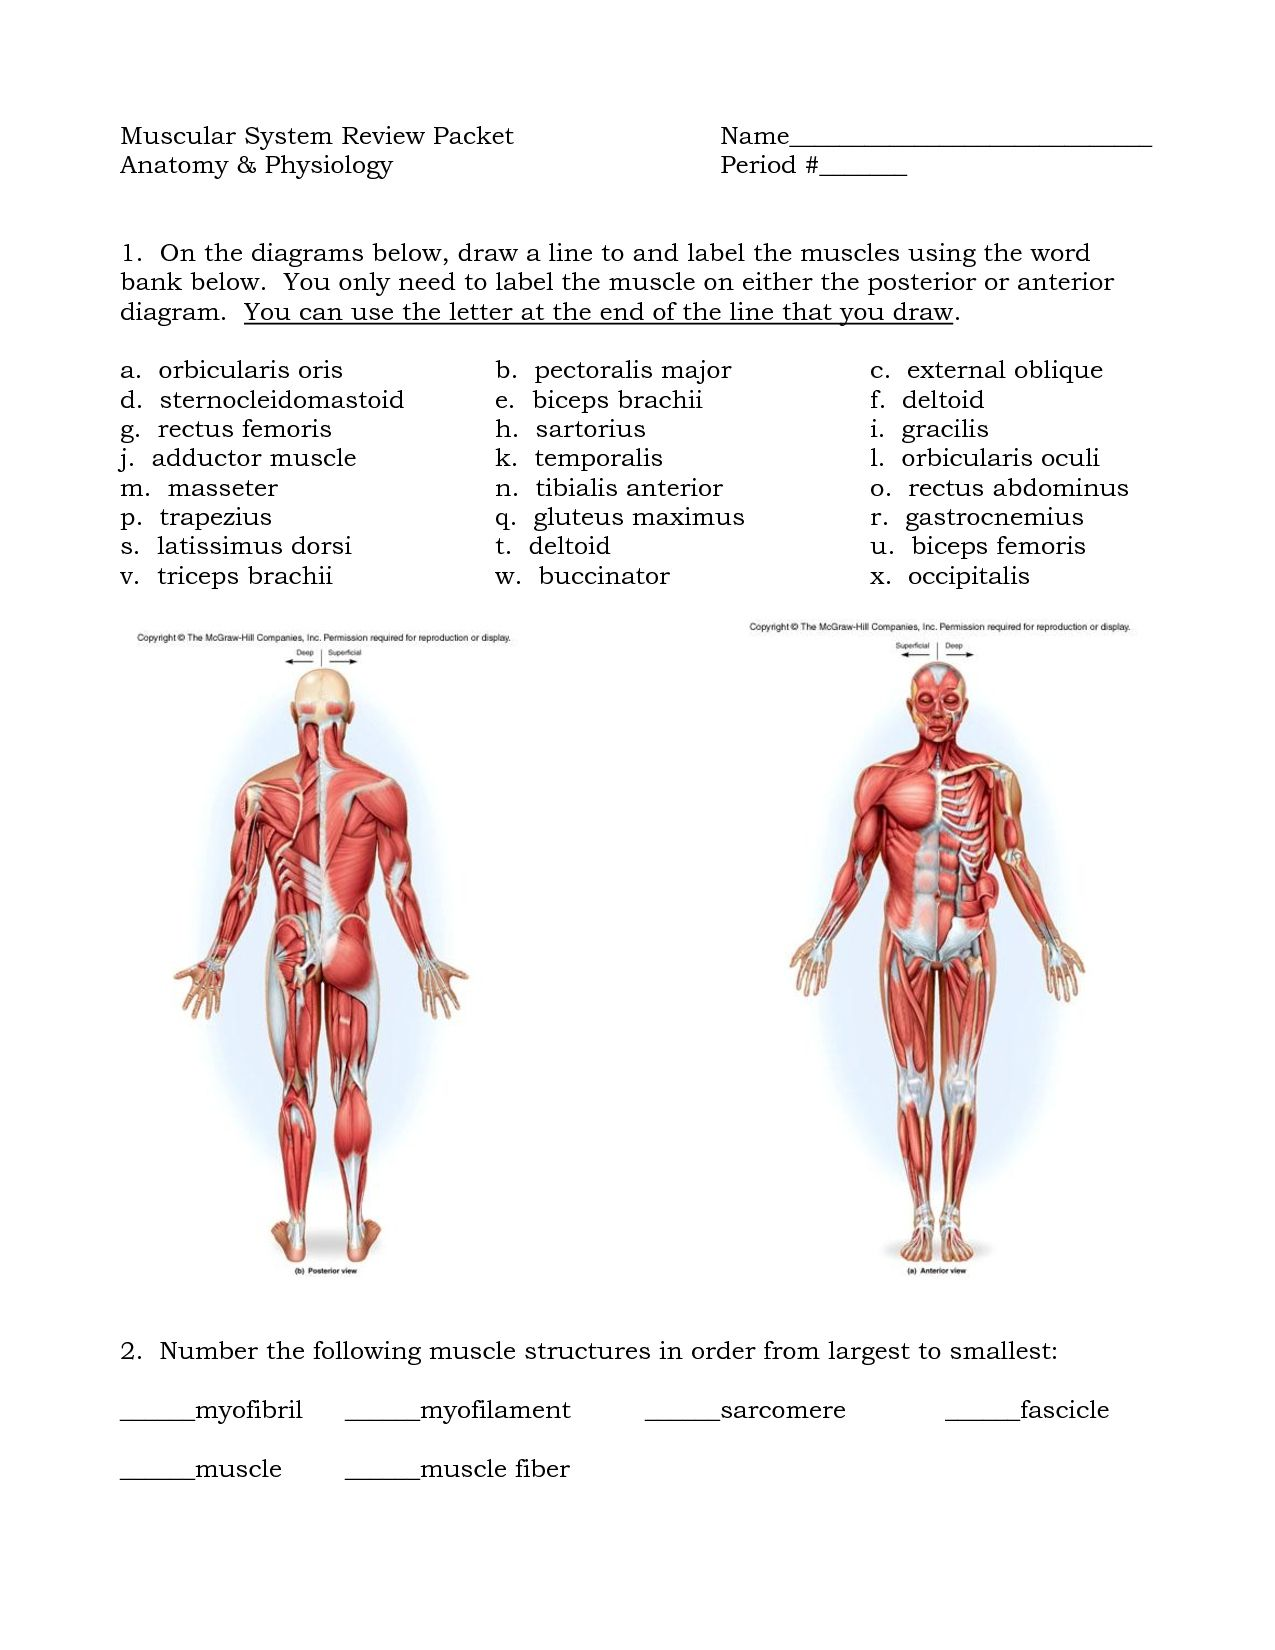 Muscle Diagram Blank   Muscle Diagram Blank 40 Elegant